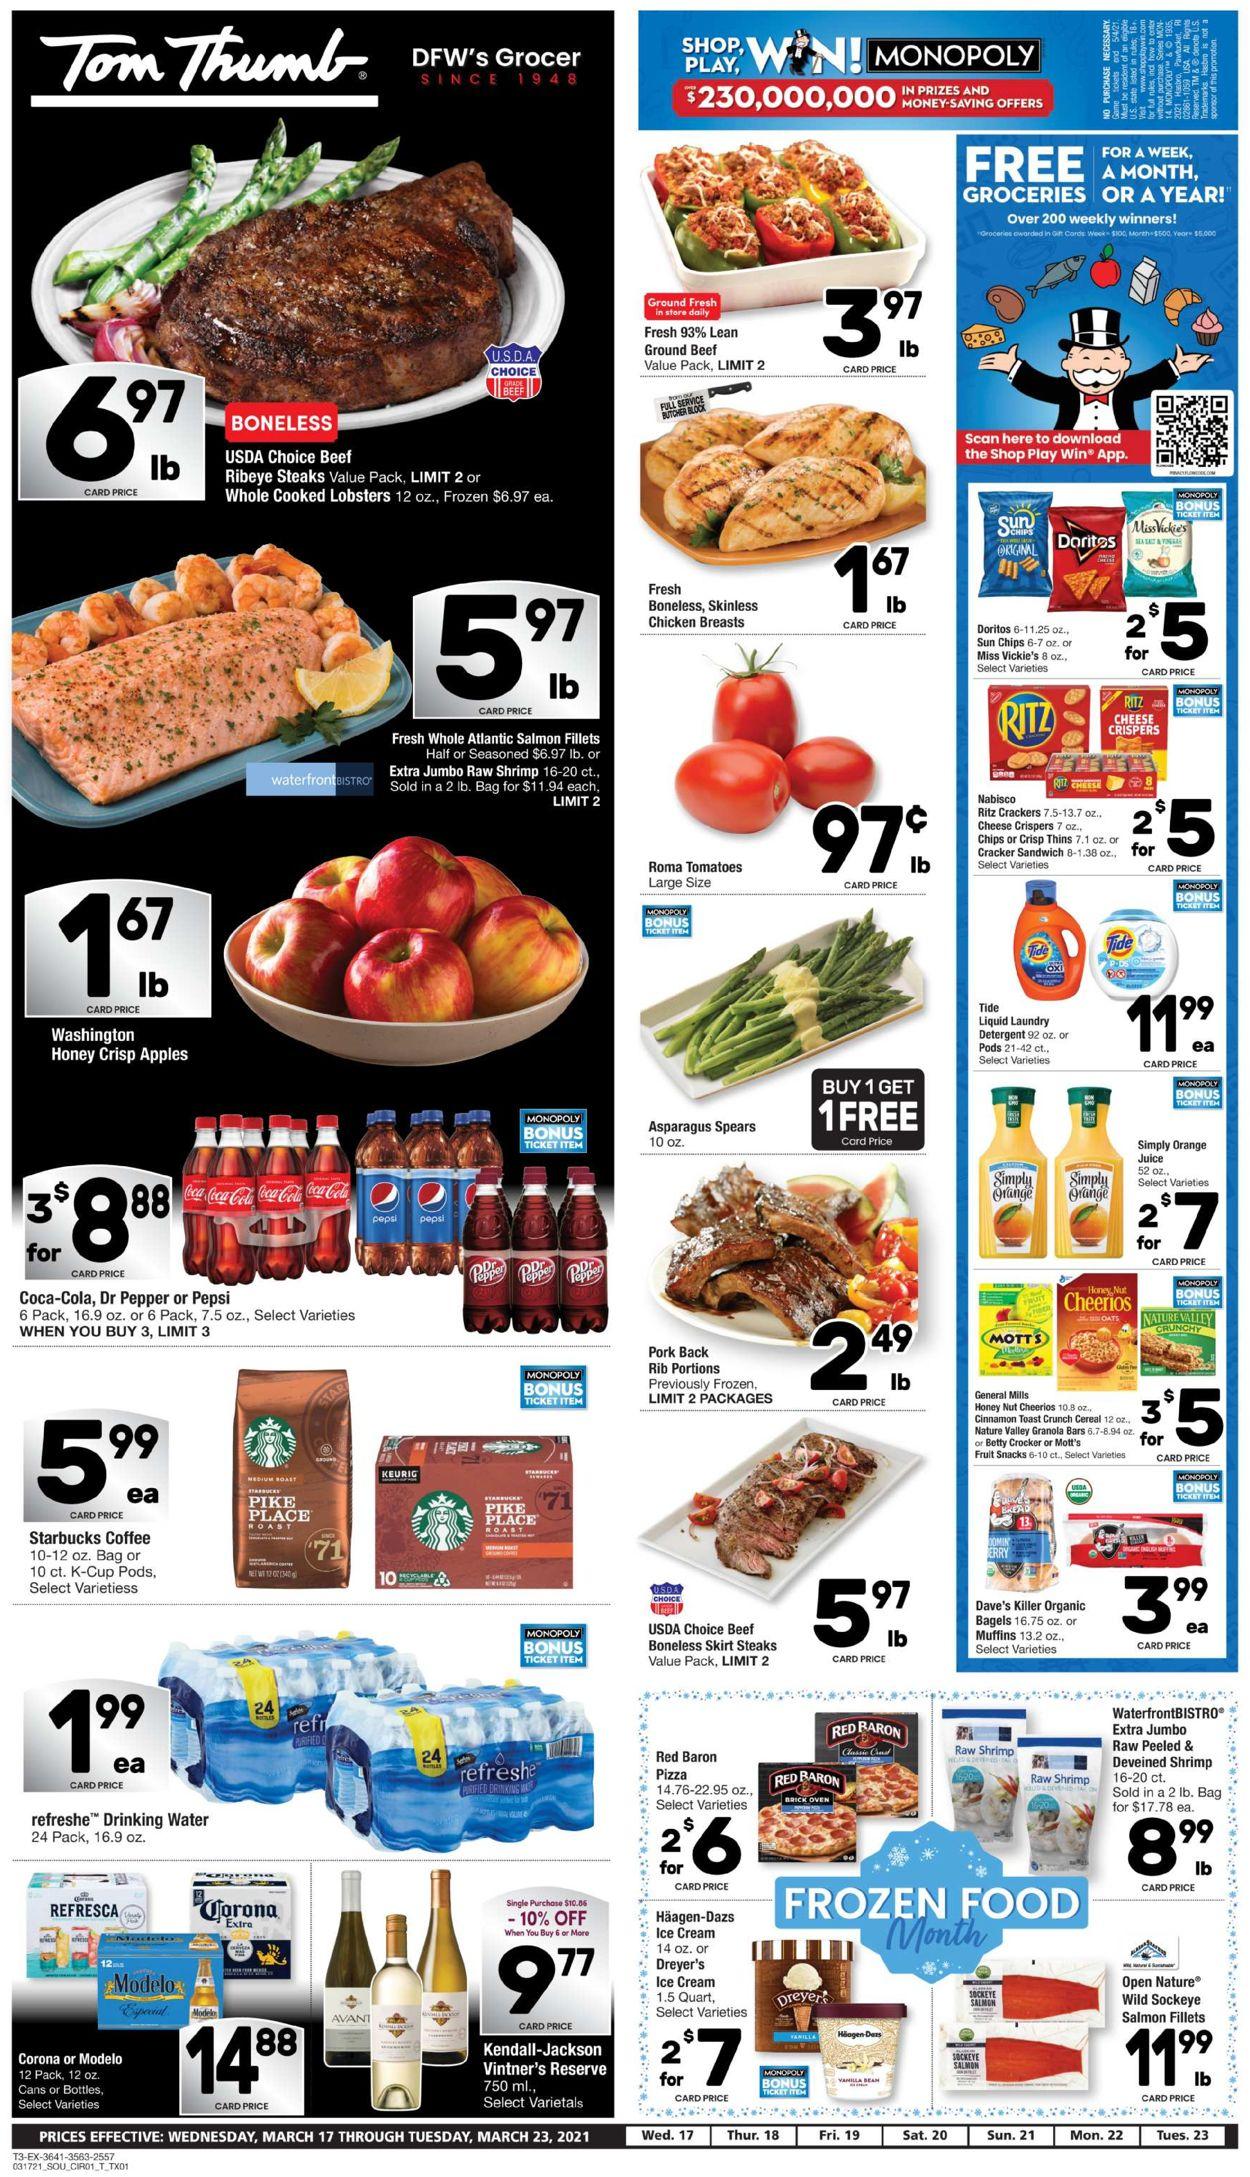 Tom Thumb Weekly Ad Circular - valid 03/17-03/23/2021